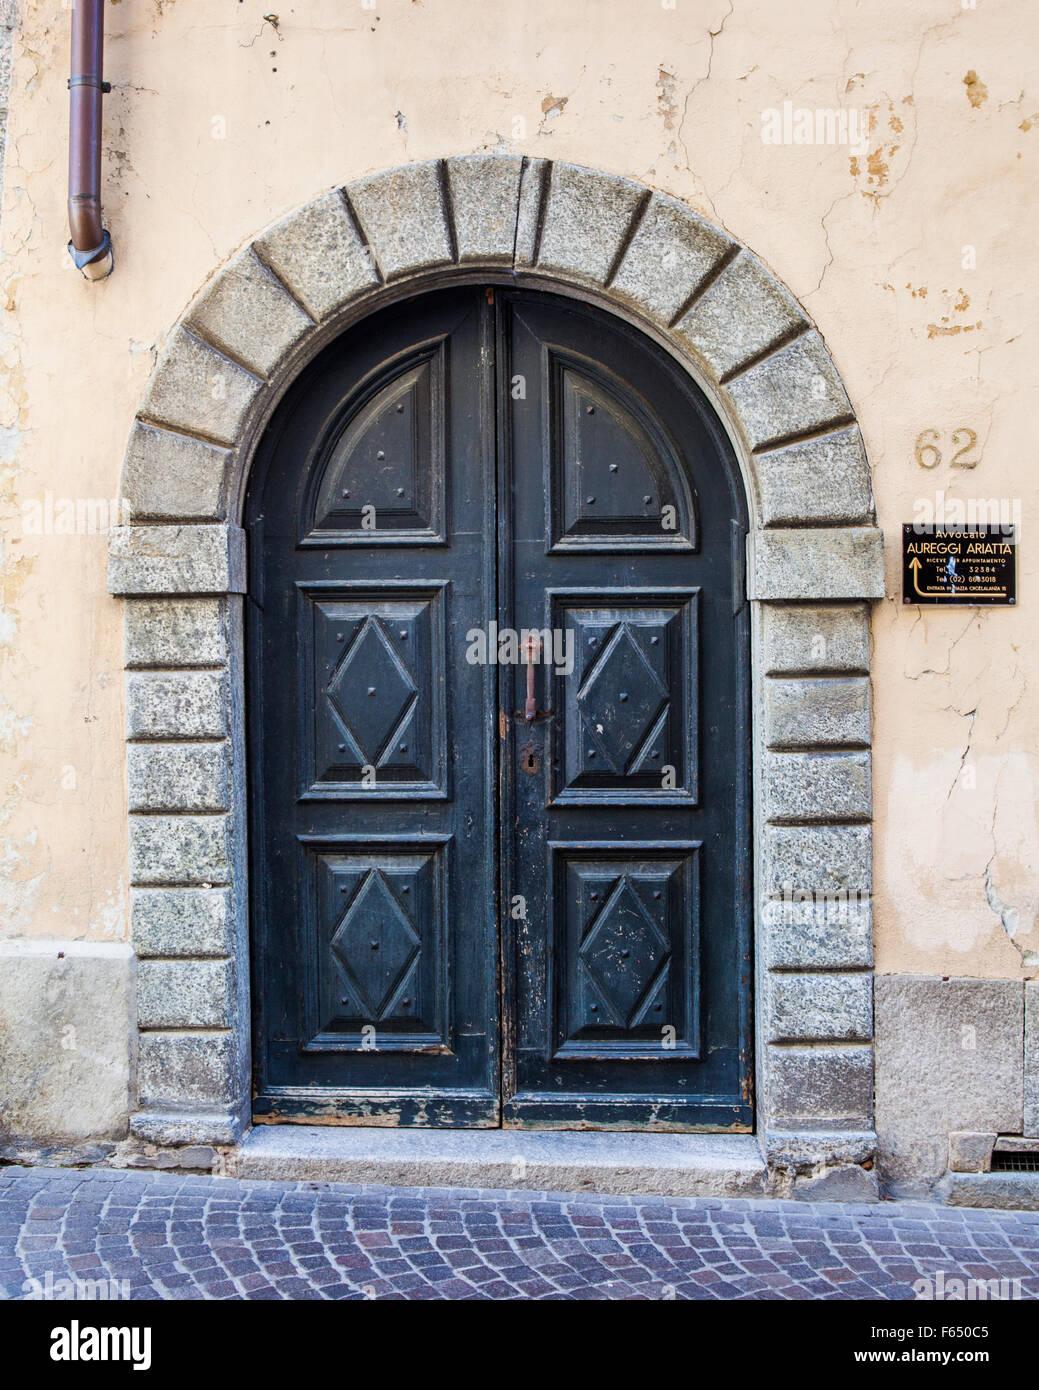 Italian doors & Italian doors Stock Photo: 89849877 - Alamy